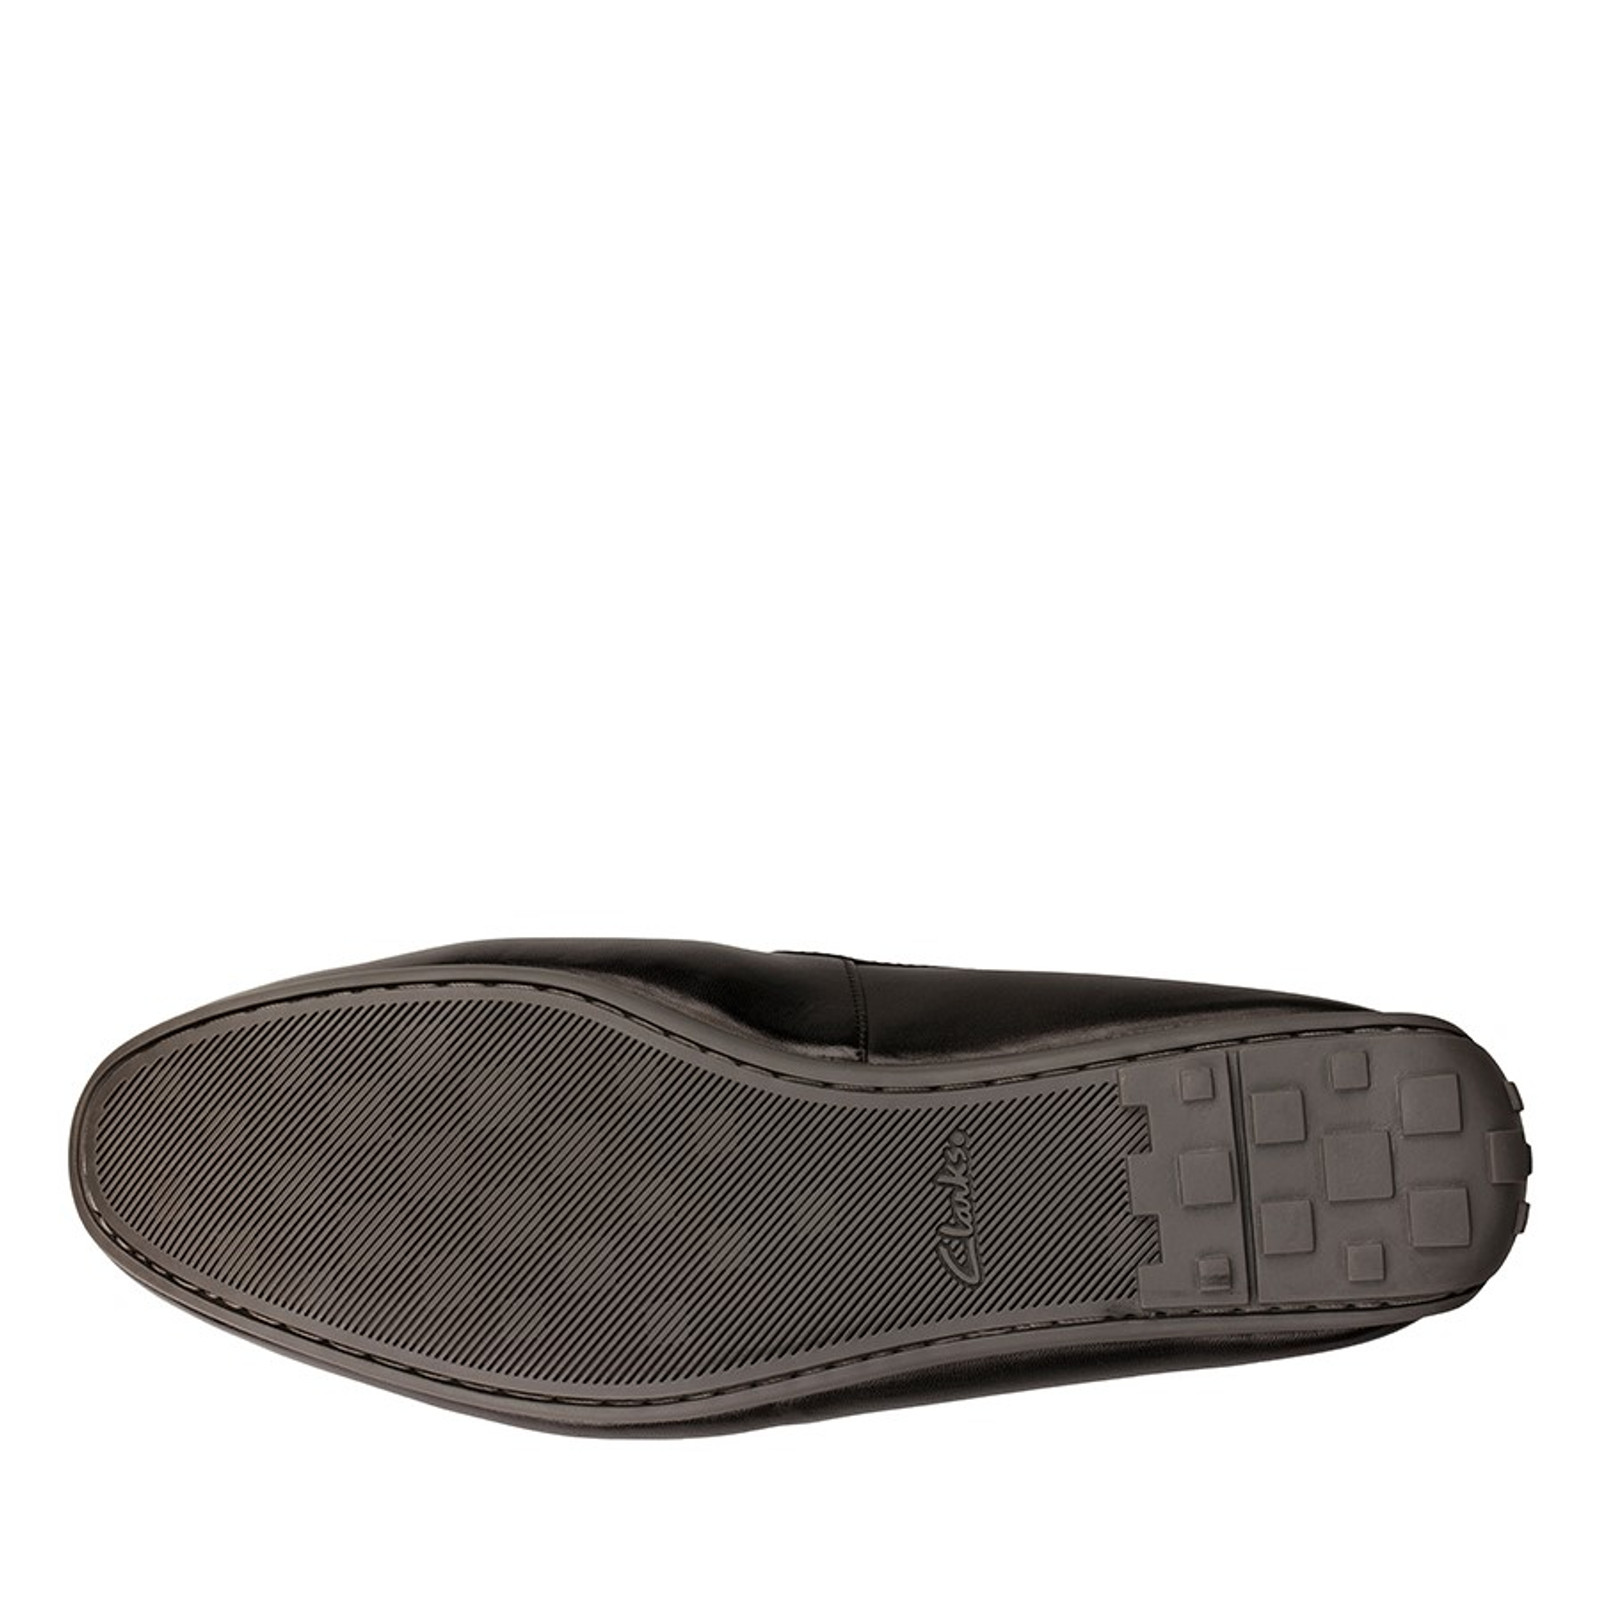 Clarks Mens REAZOR PLAIN Black Leather